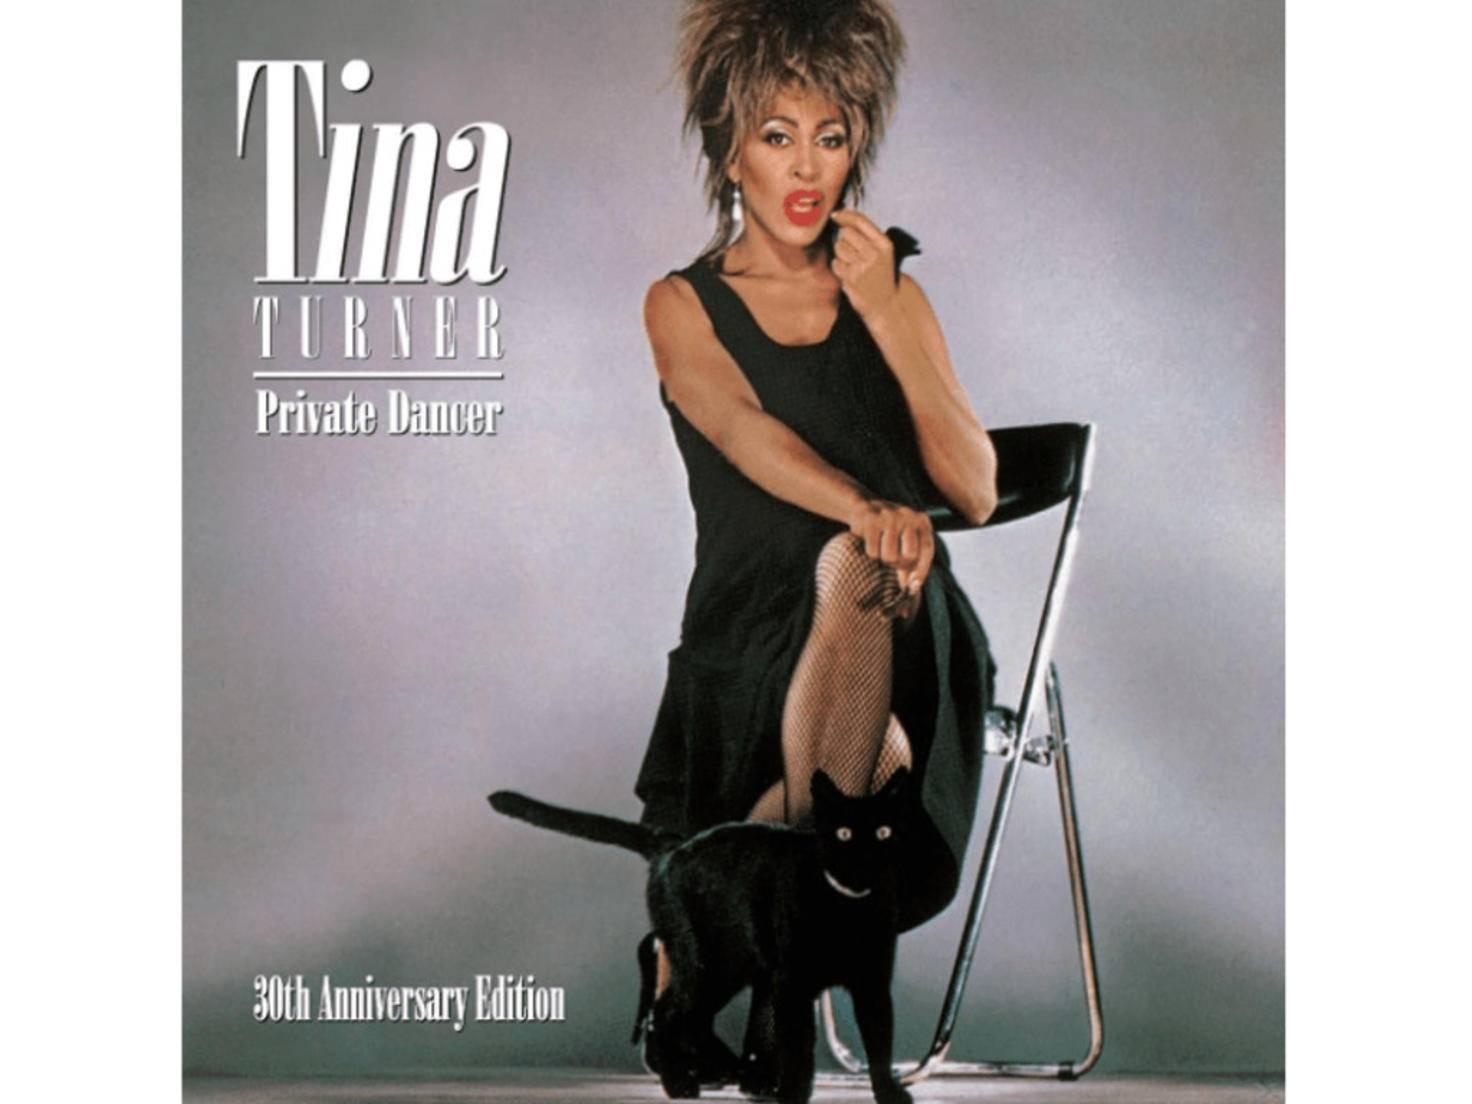 Tina Turner Private Dancer.jpg